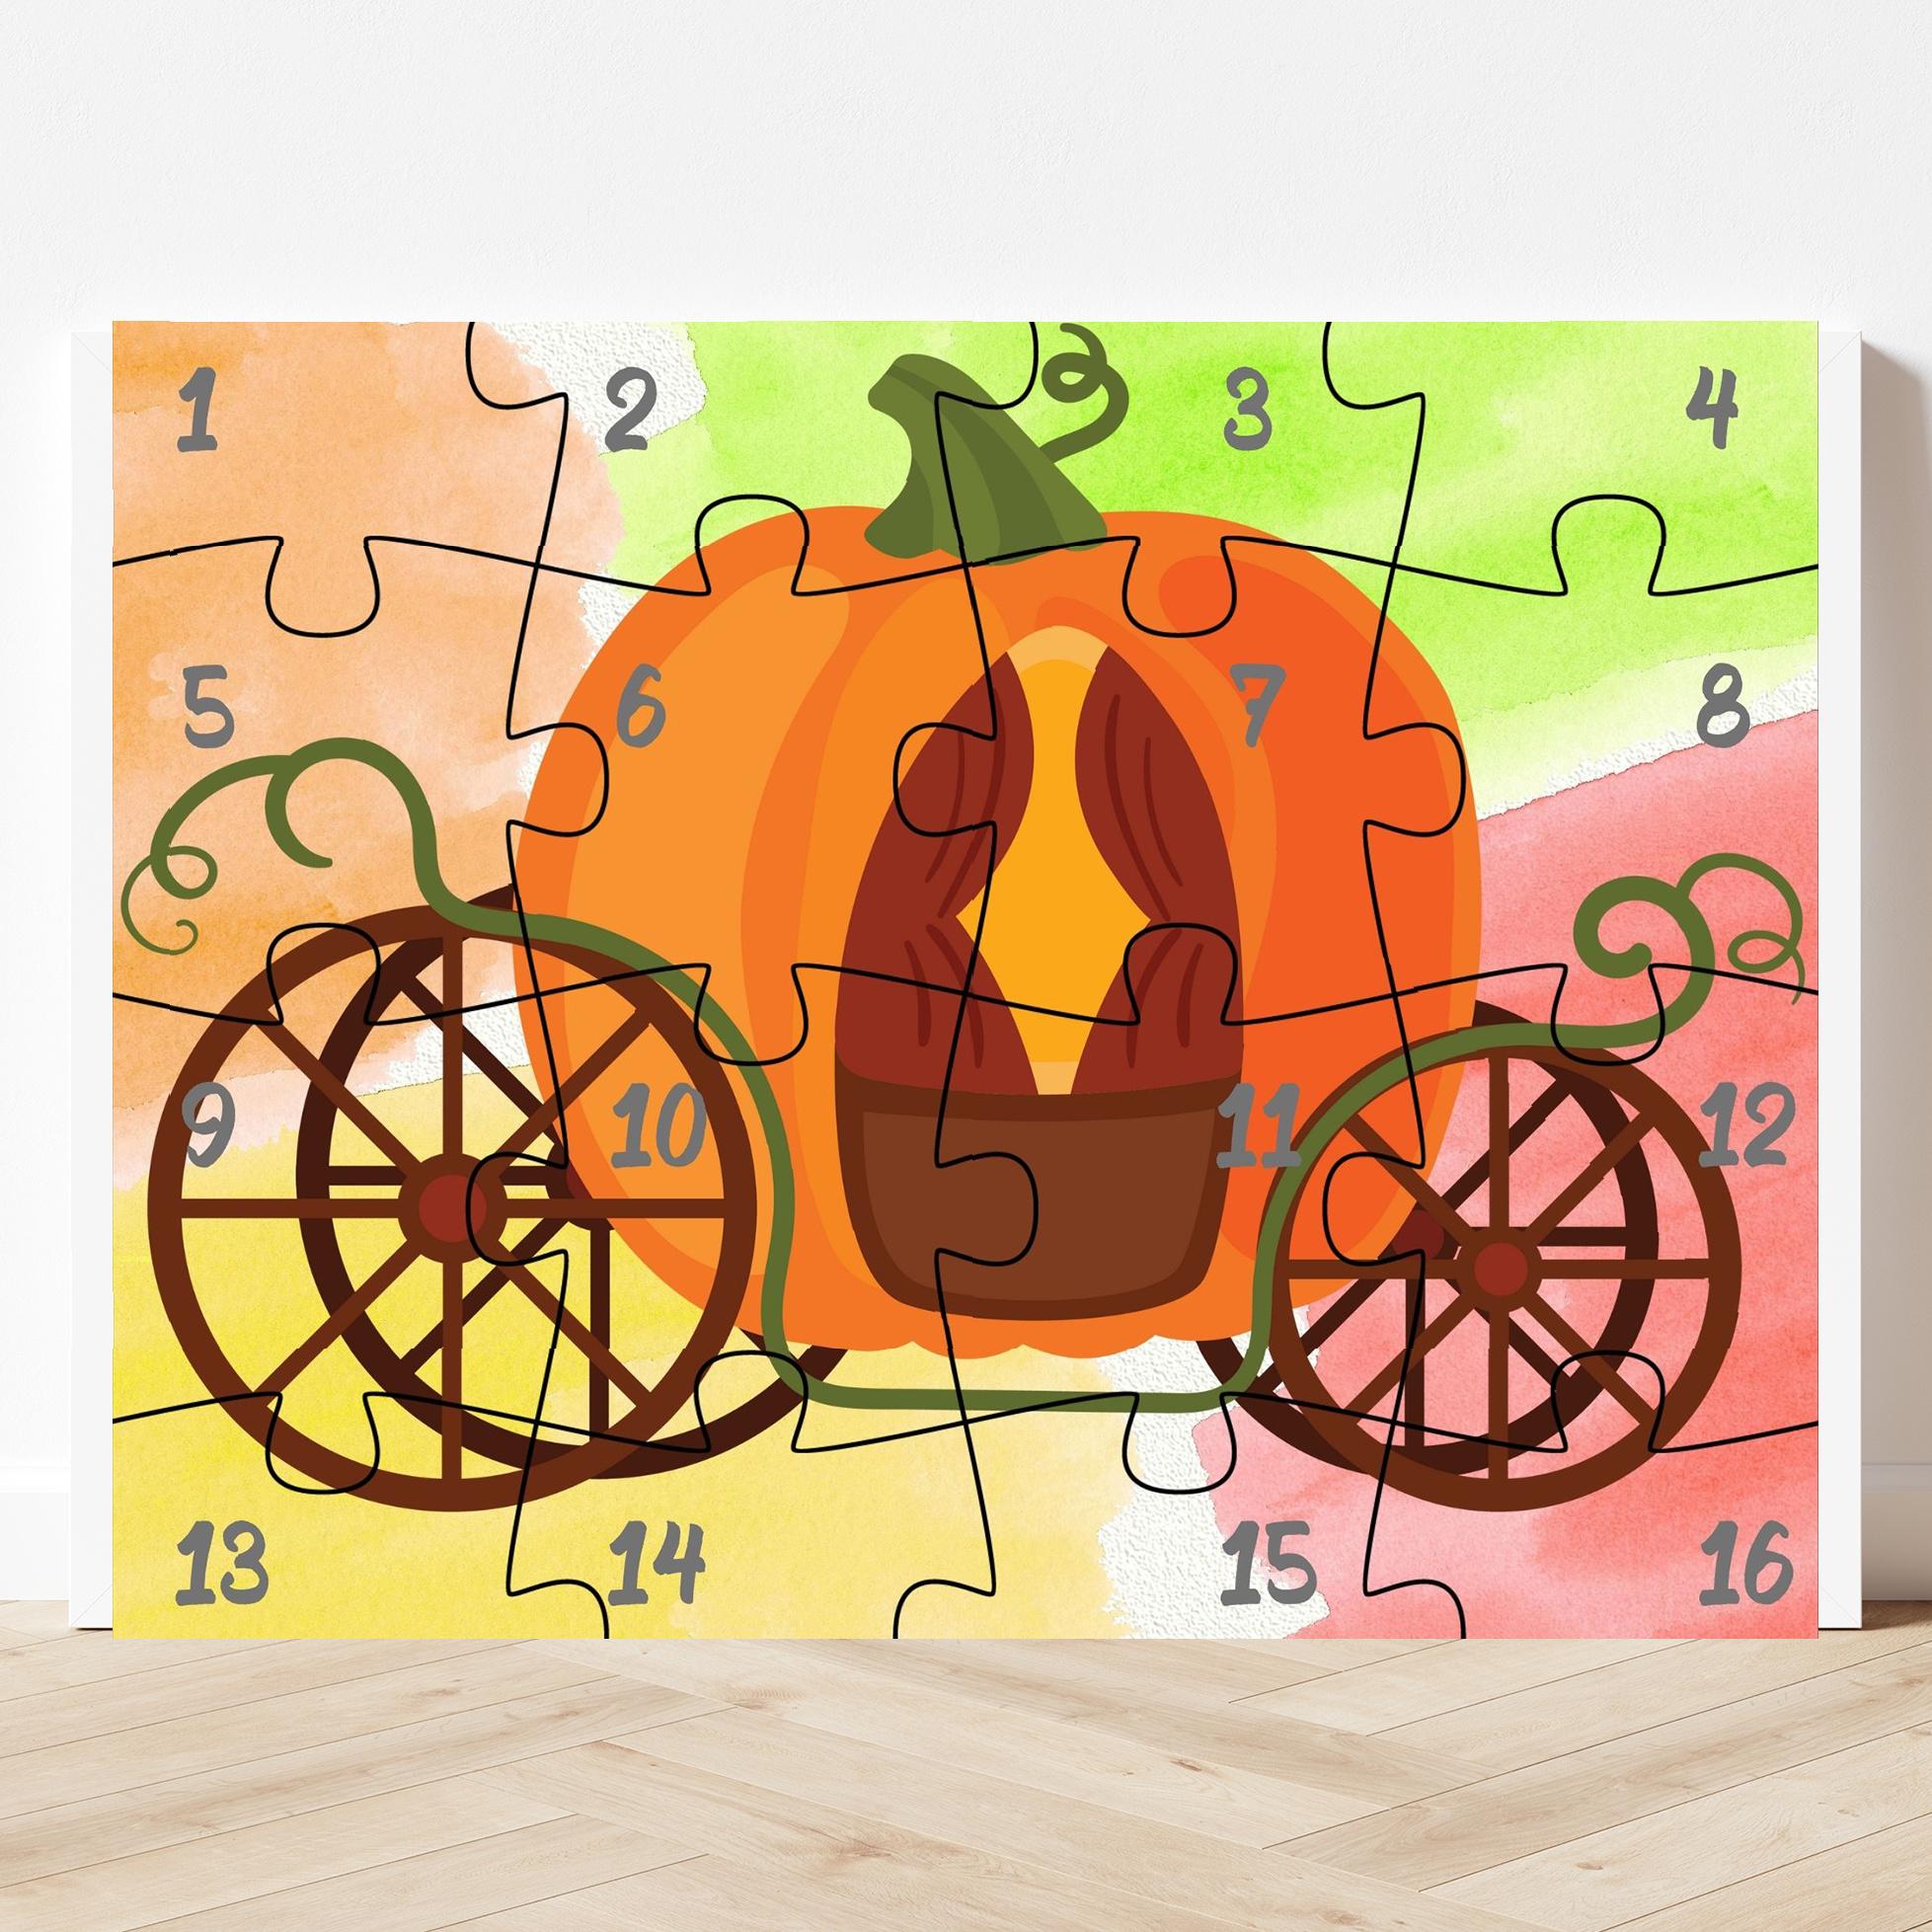 printable pumpkin puzzle with 16 pieces